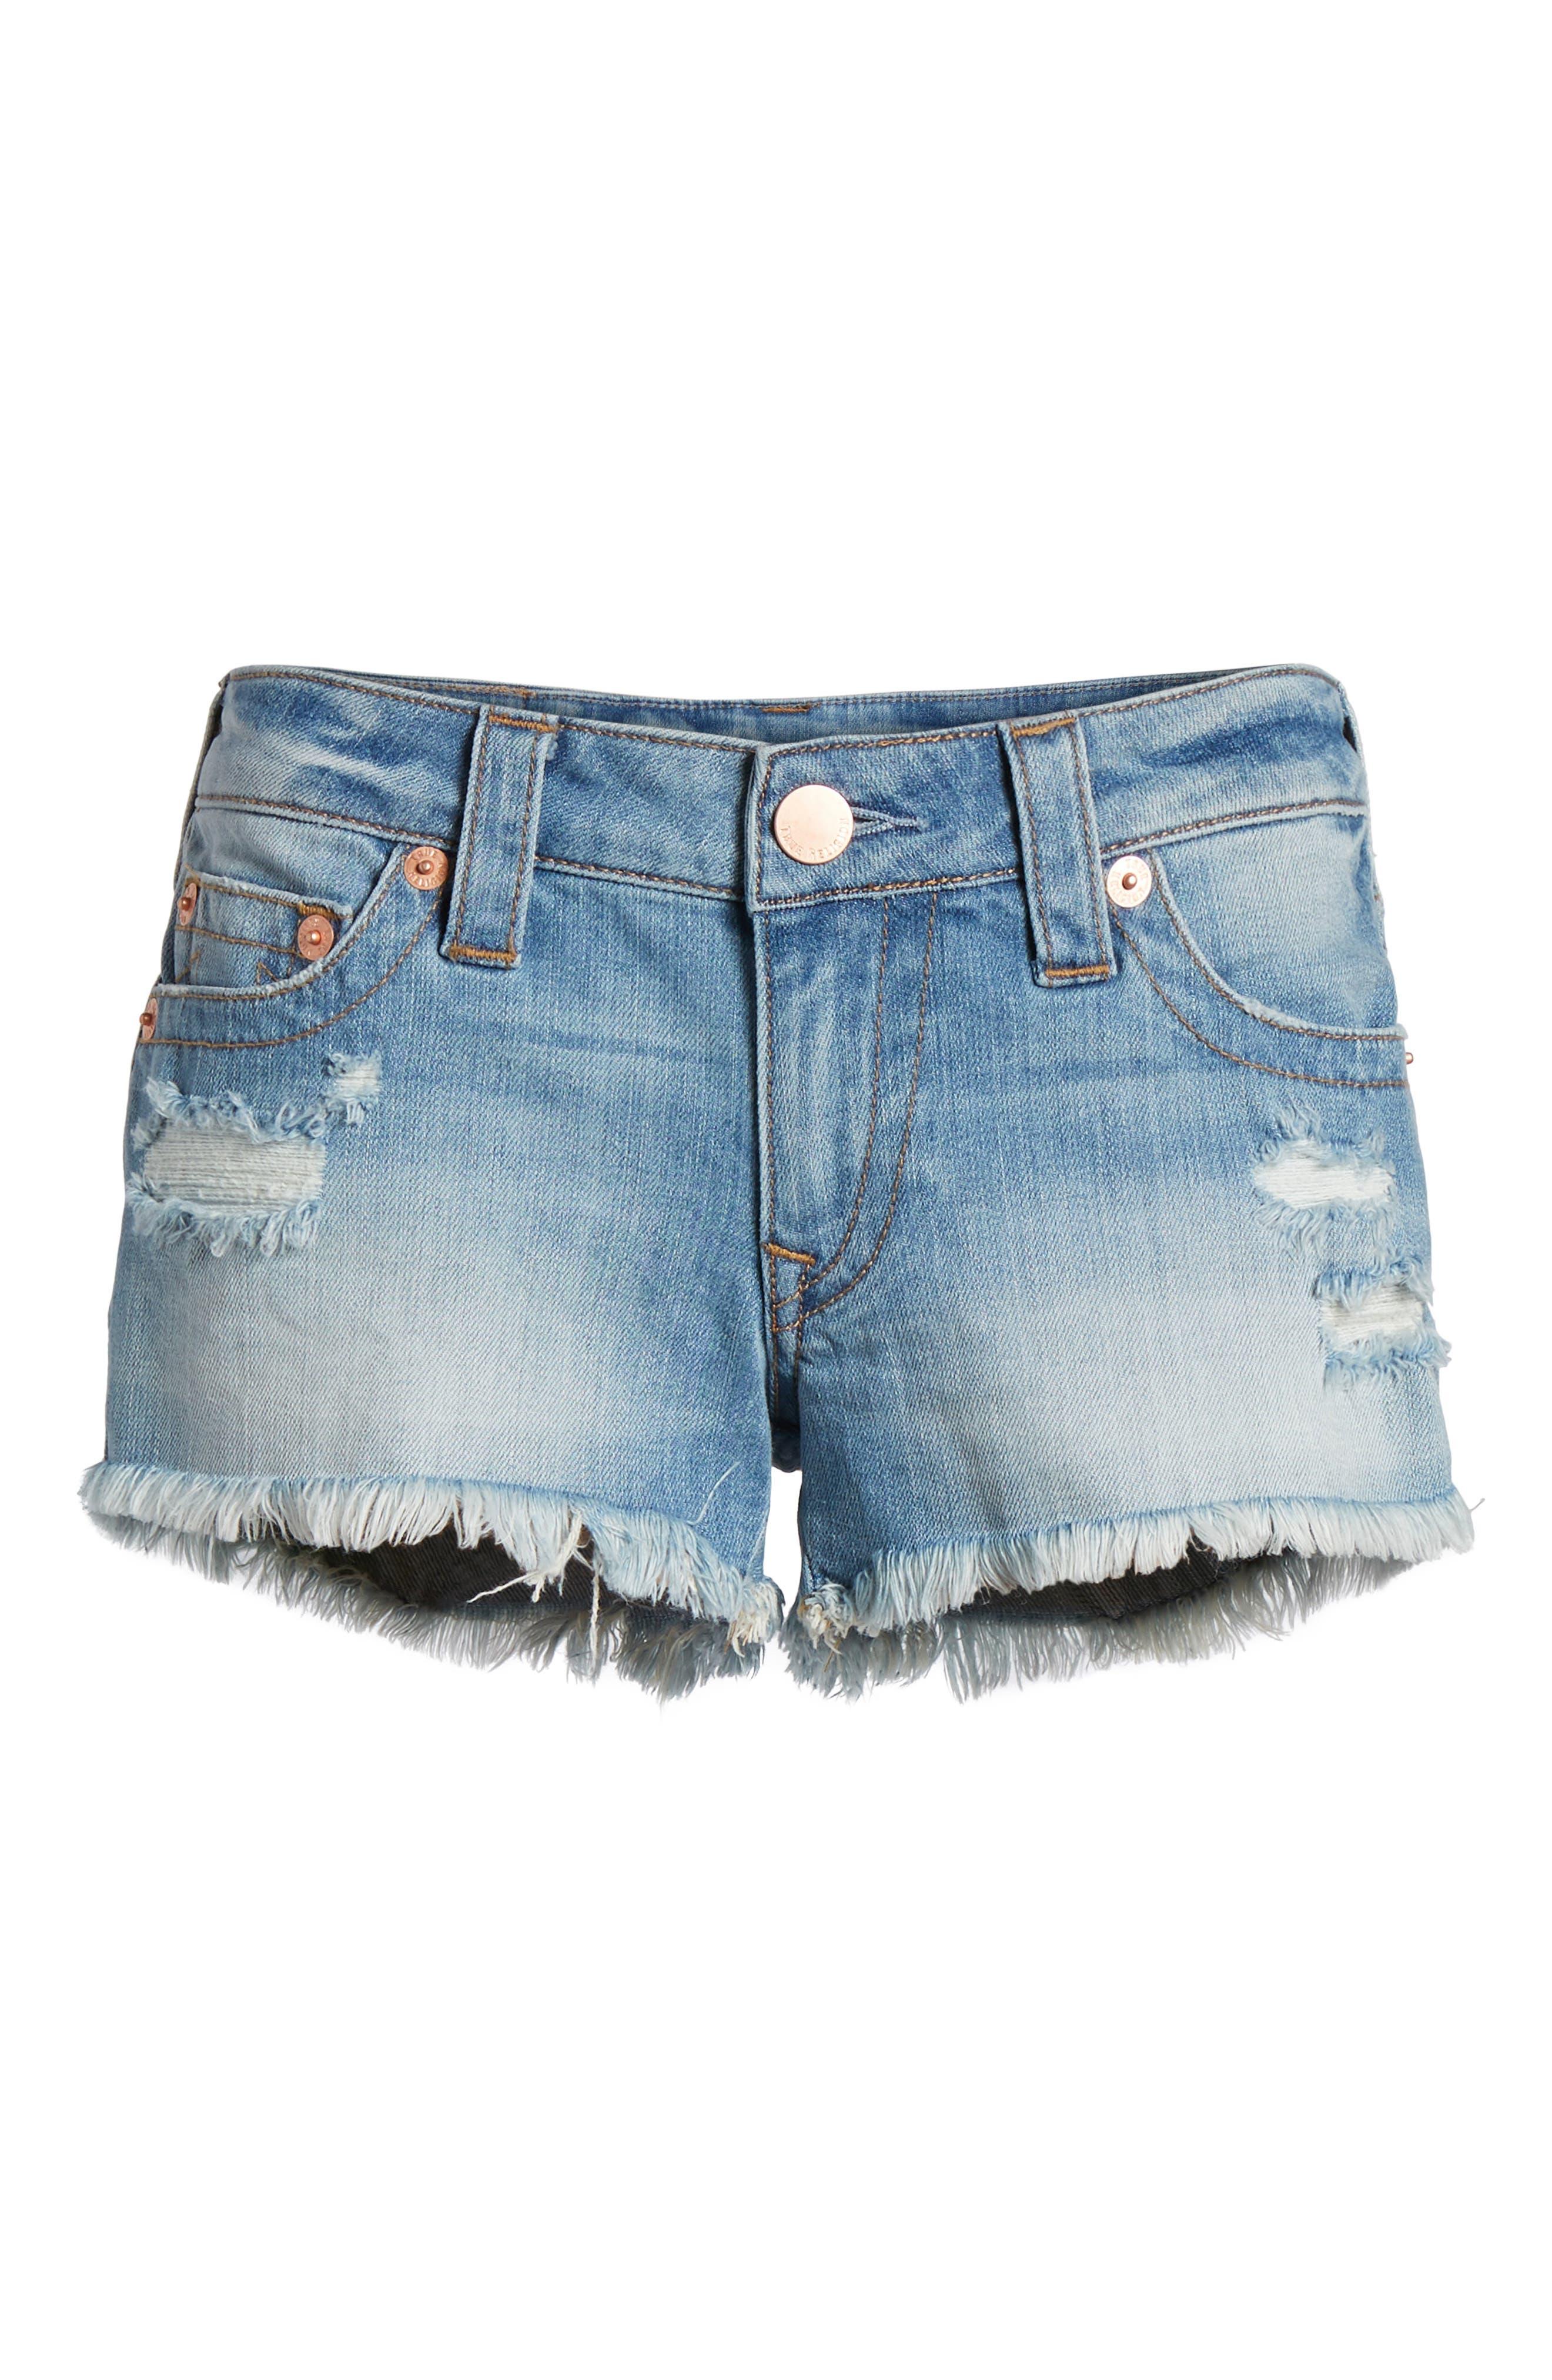 Joey Flap Pocket Cutoff Denim Shorts,                             Alternate thumbnail 7, color,                             Eshl Third Quarter